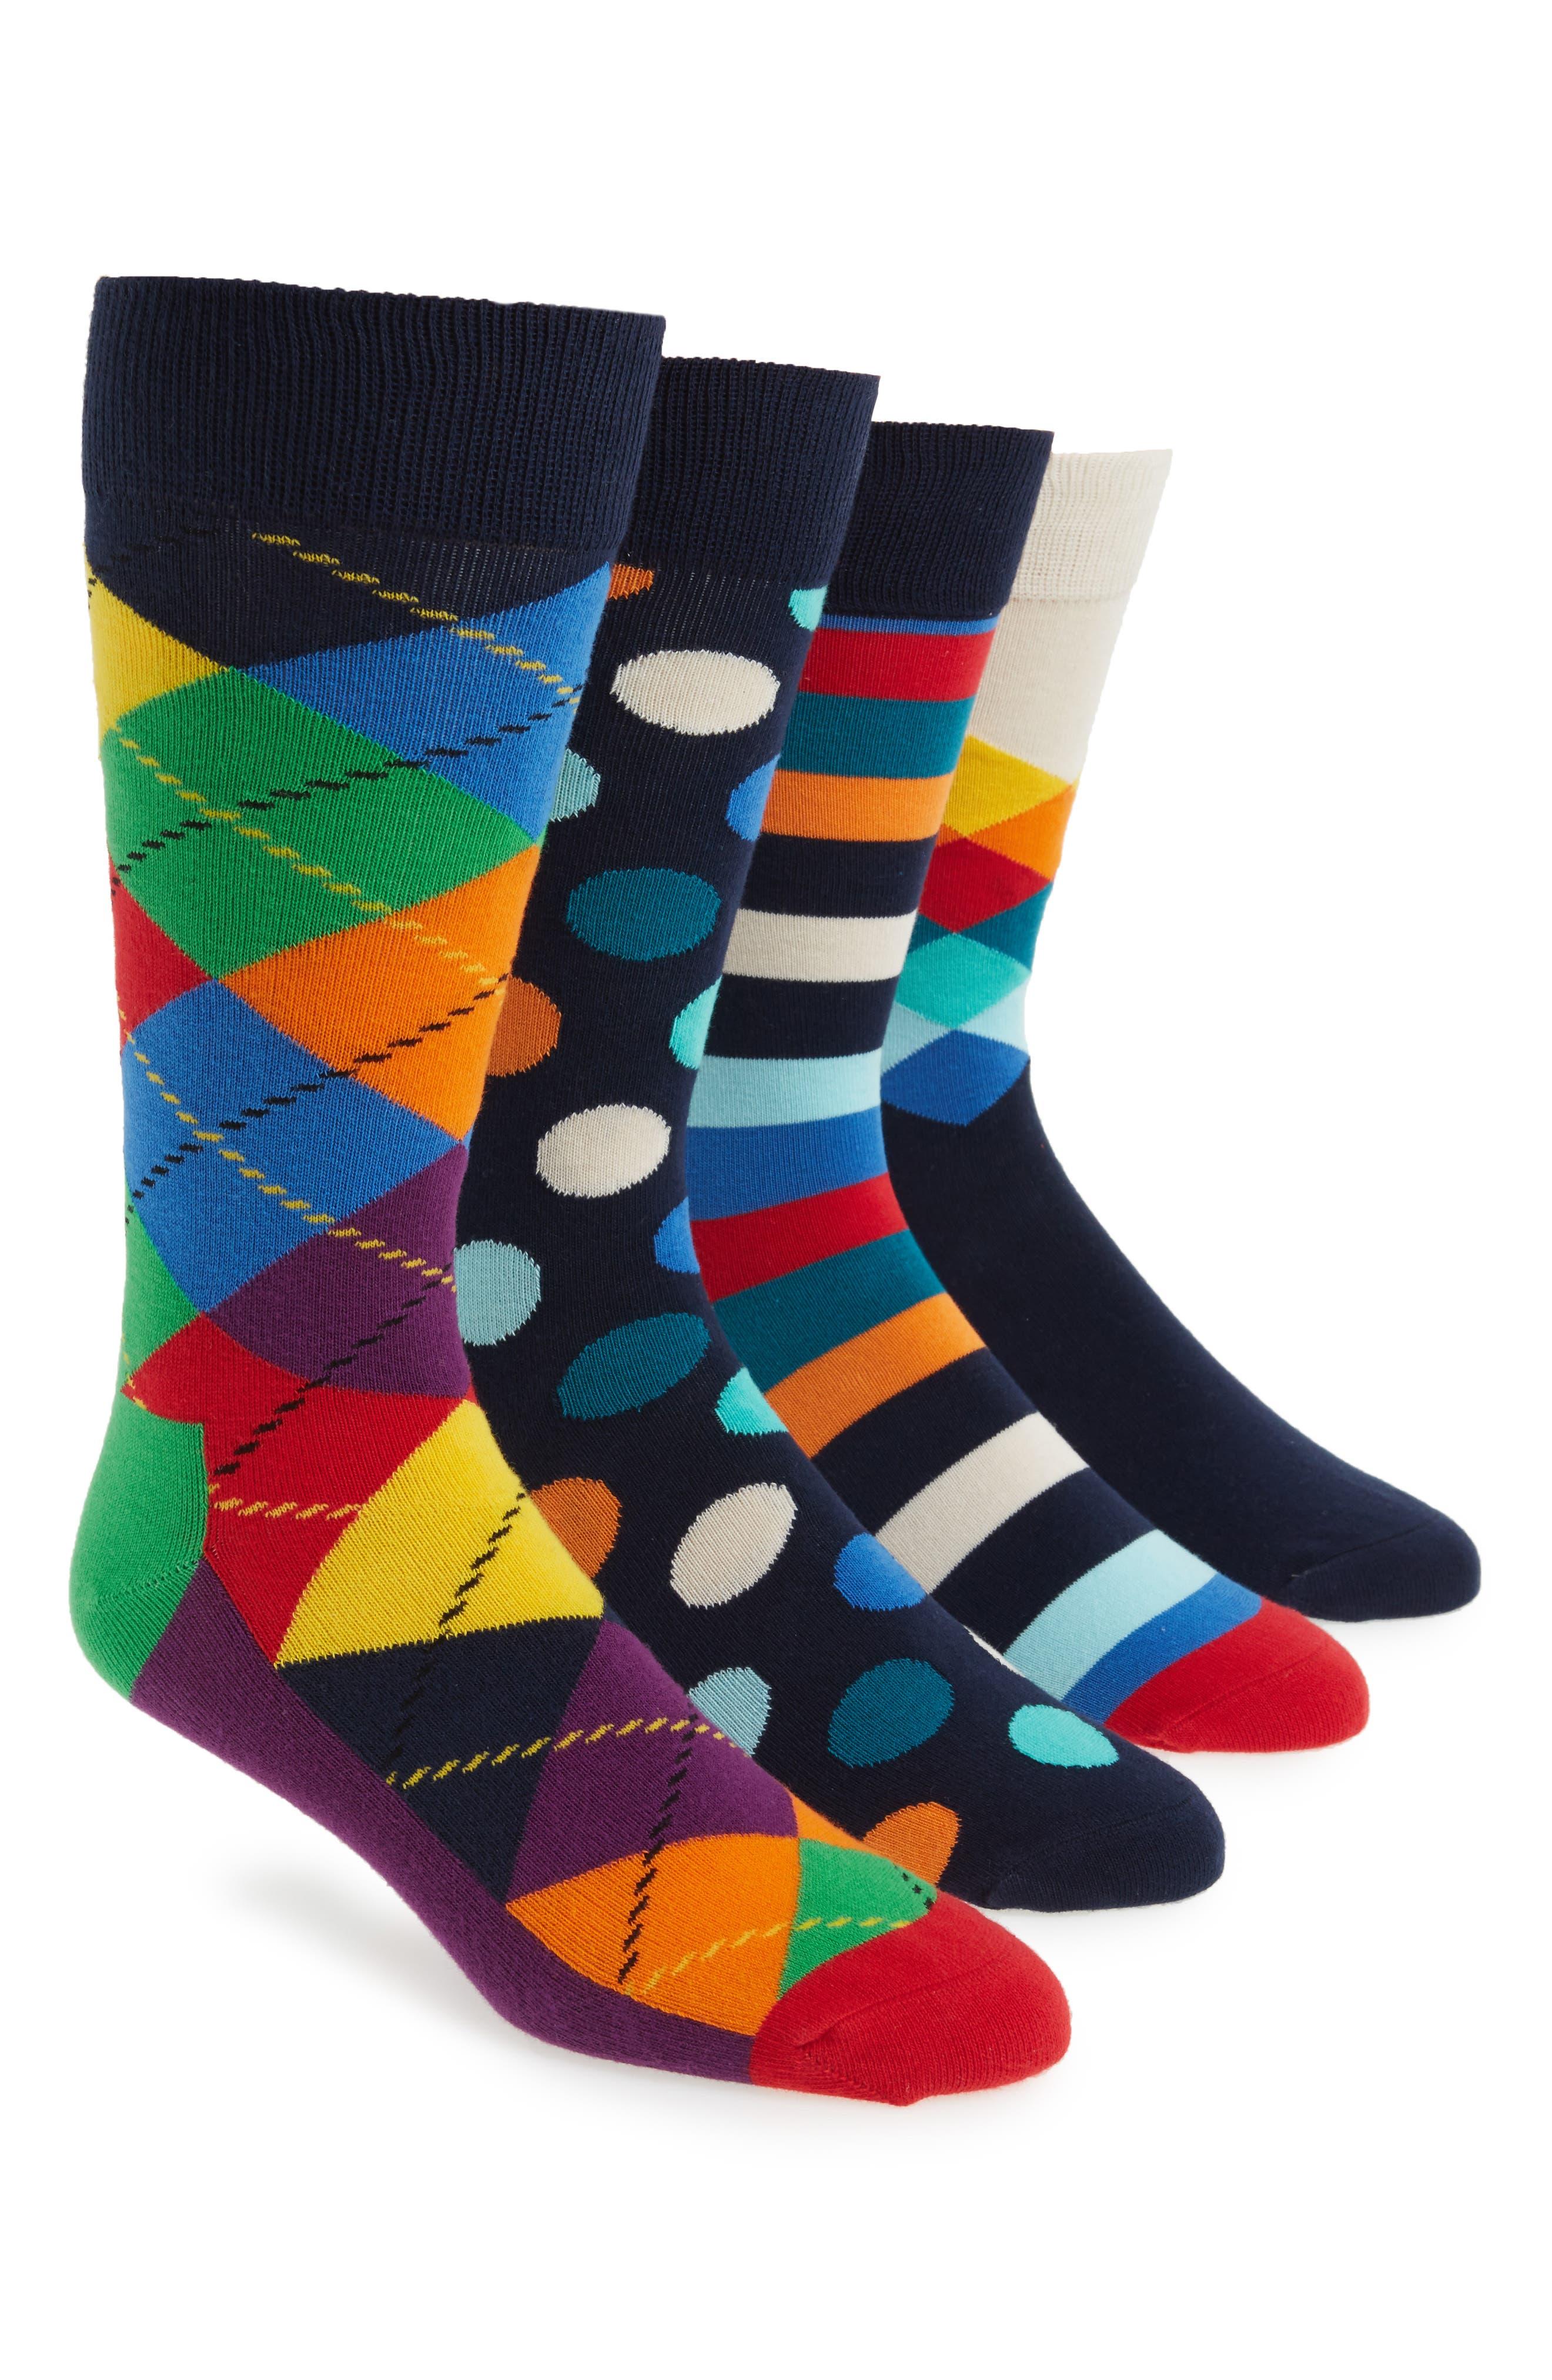 Happy Socks 4-Pack Mixed Pattern Socks ($48 Value)